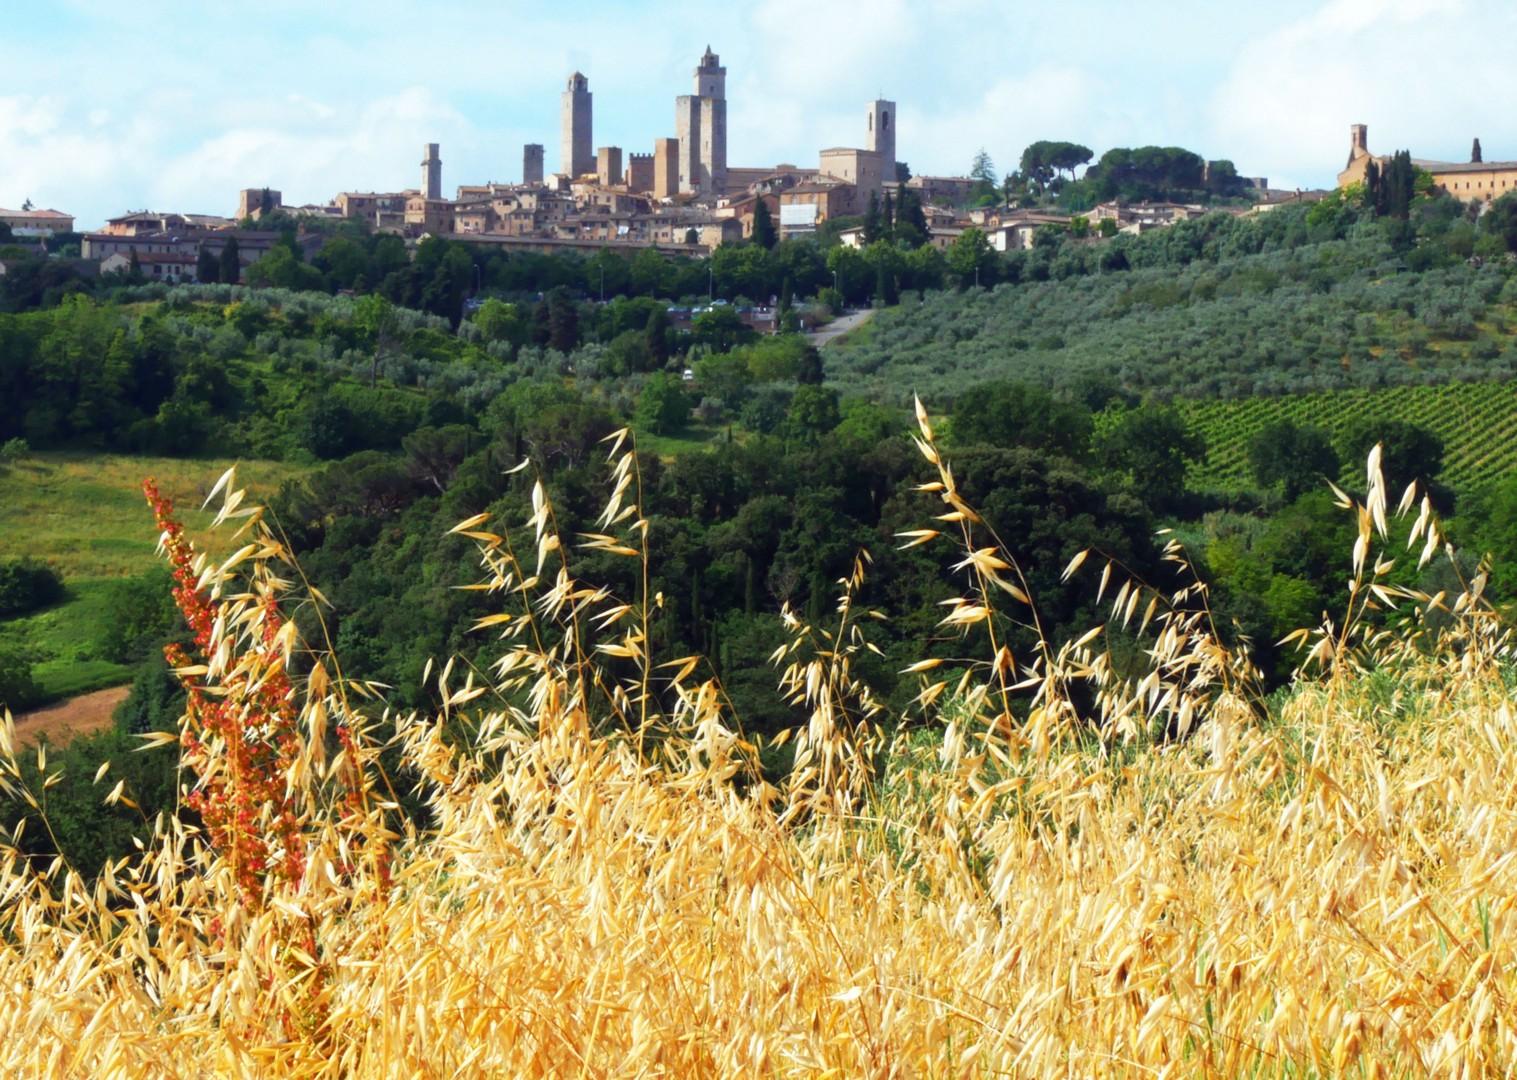 san-gim-corn-field-tuscany-cycling.jpg - Italy - Tuscany Tourer - Self Guided Road Cycling Holiday - Italia Road Cycling